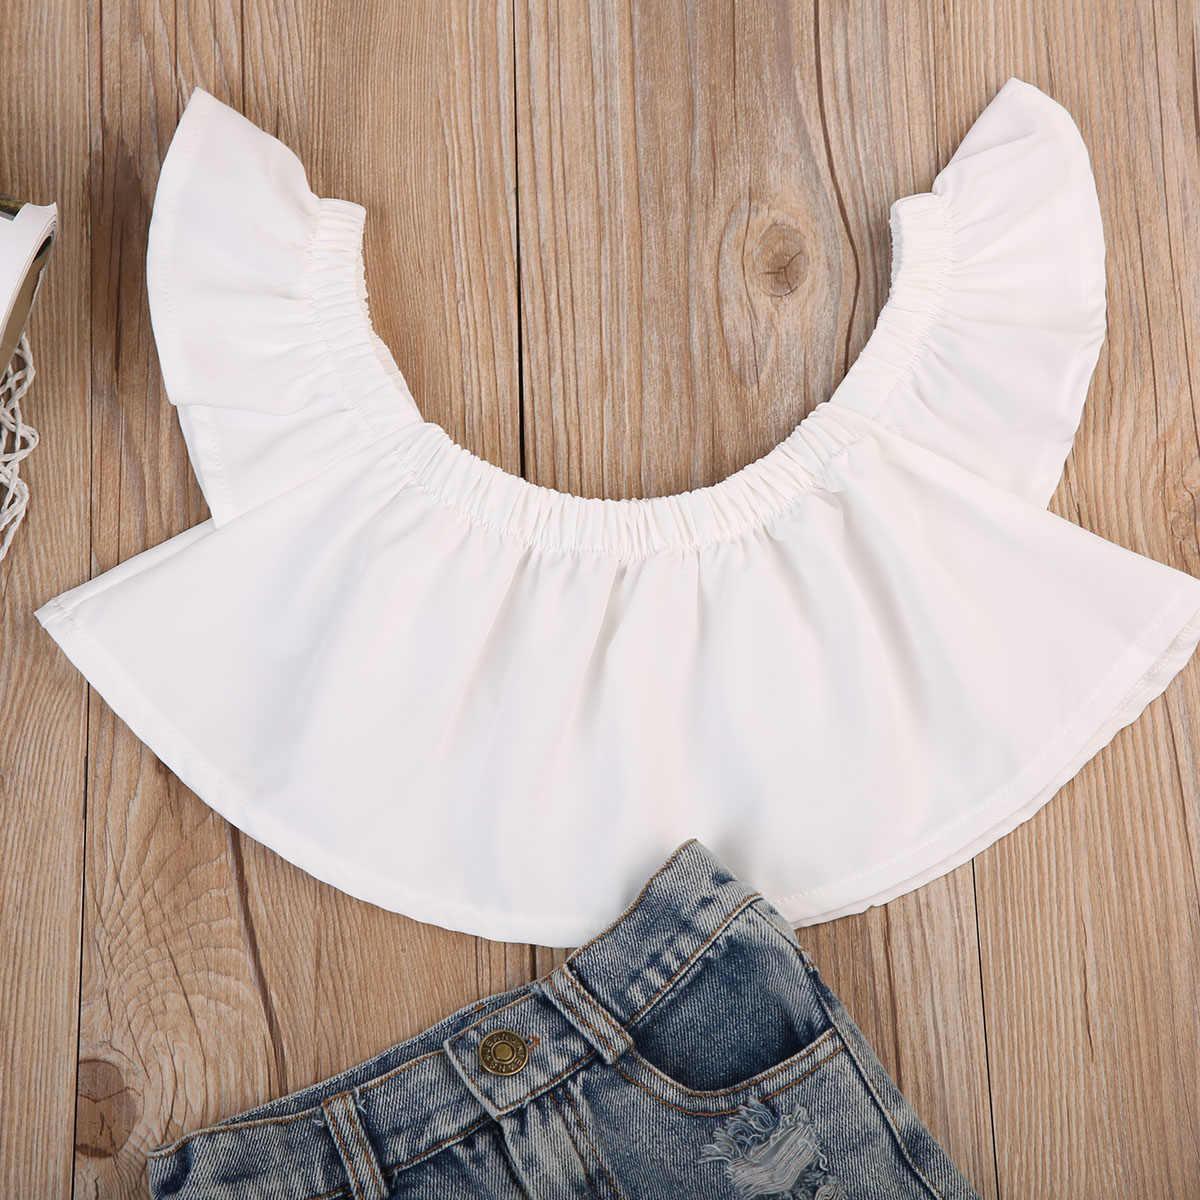 Bayi Street Style Pakaian Set Bayi Anak-anak Bayi Anak Perempuan Off Bahu Tops Blouse + Ripped Lubang Denim Jean Celana Pakaian